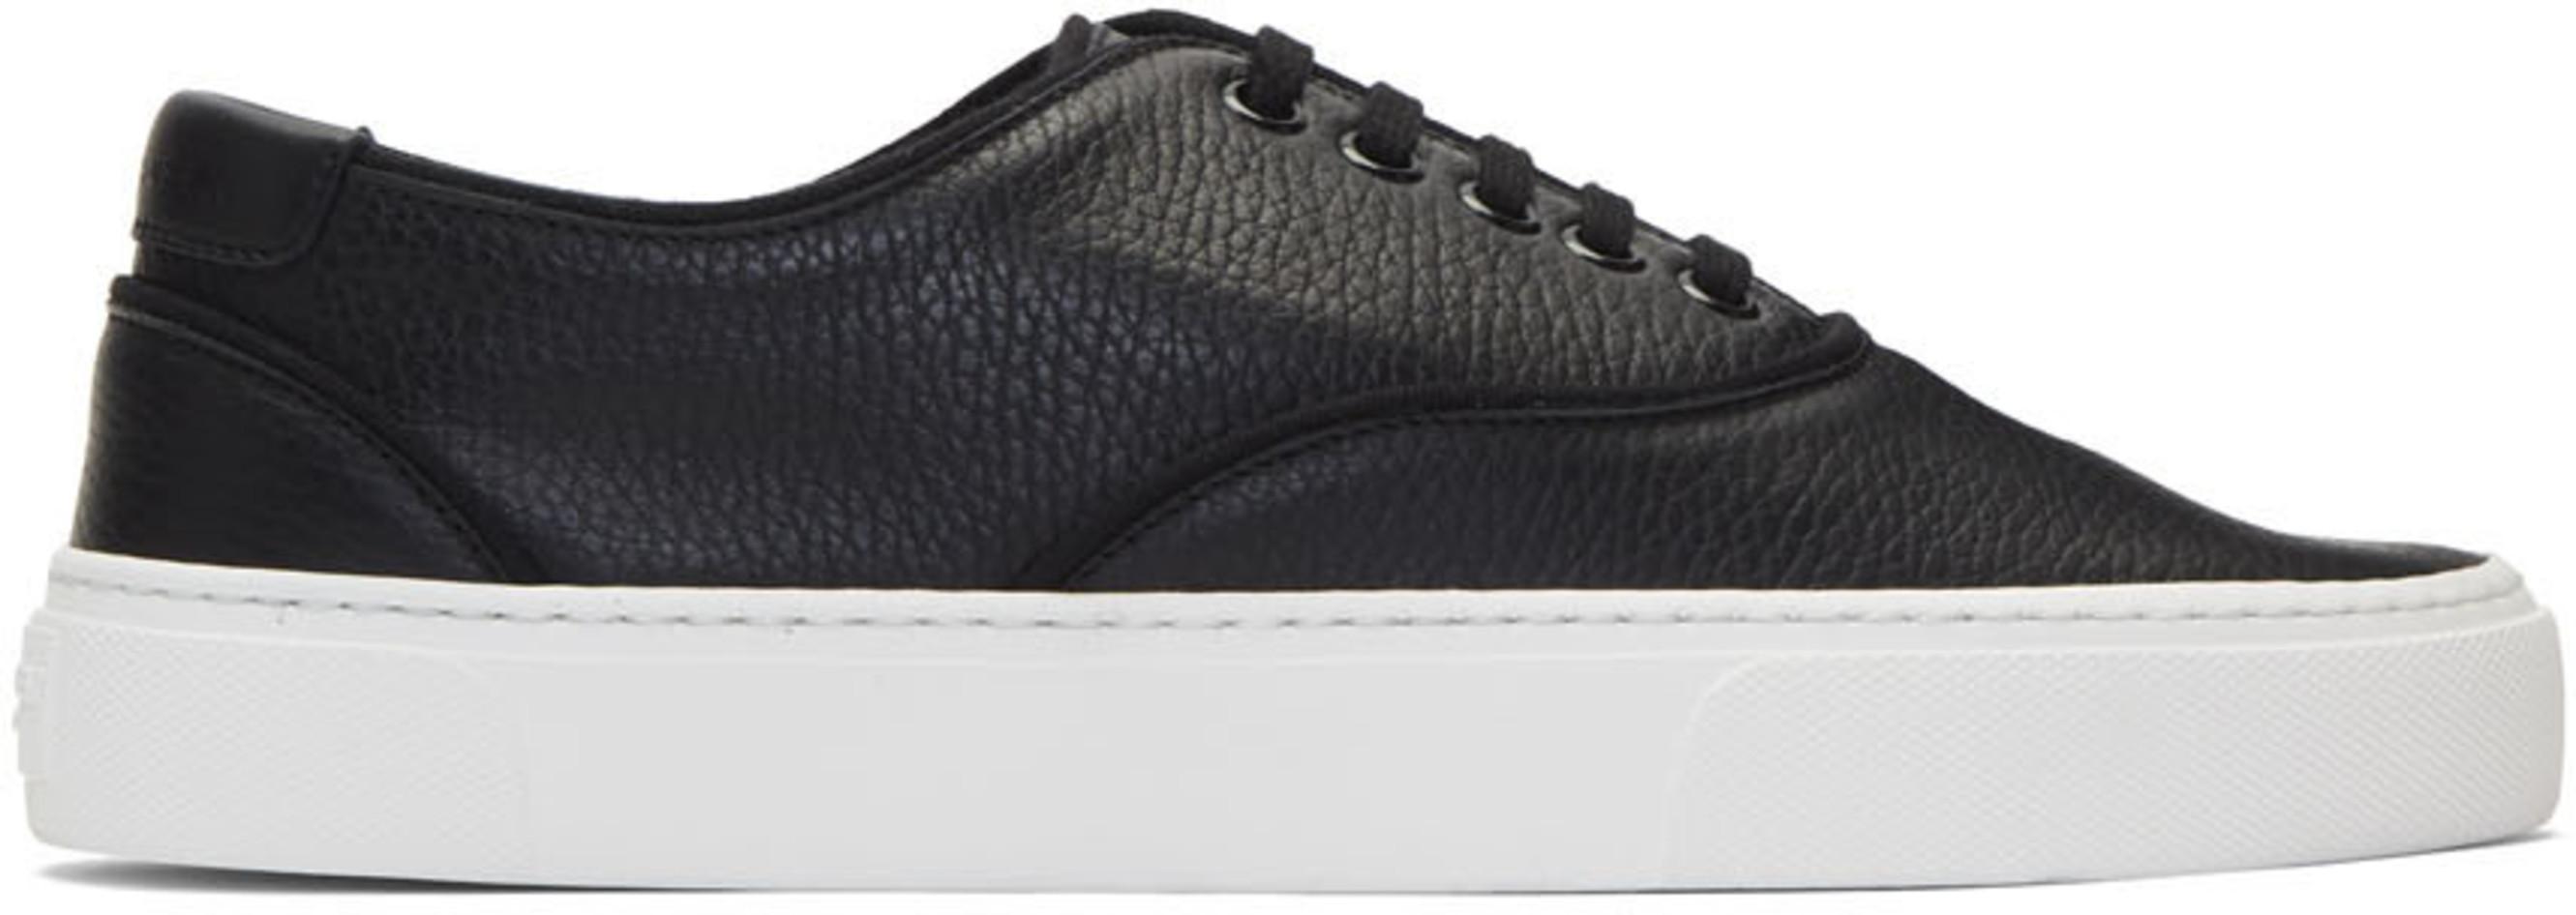 a23a593a286 Black Venice Sneakers